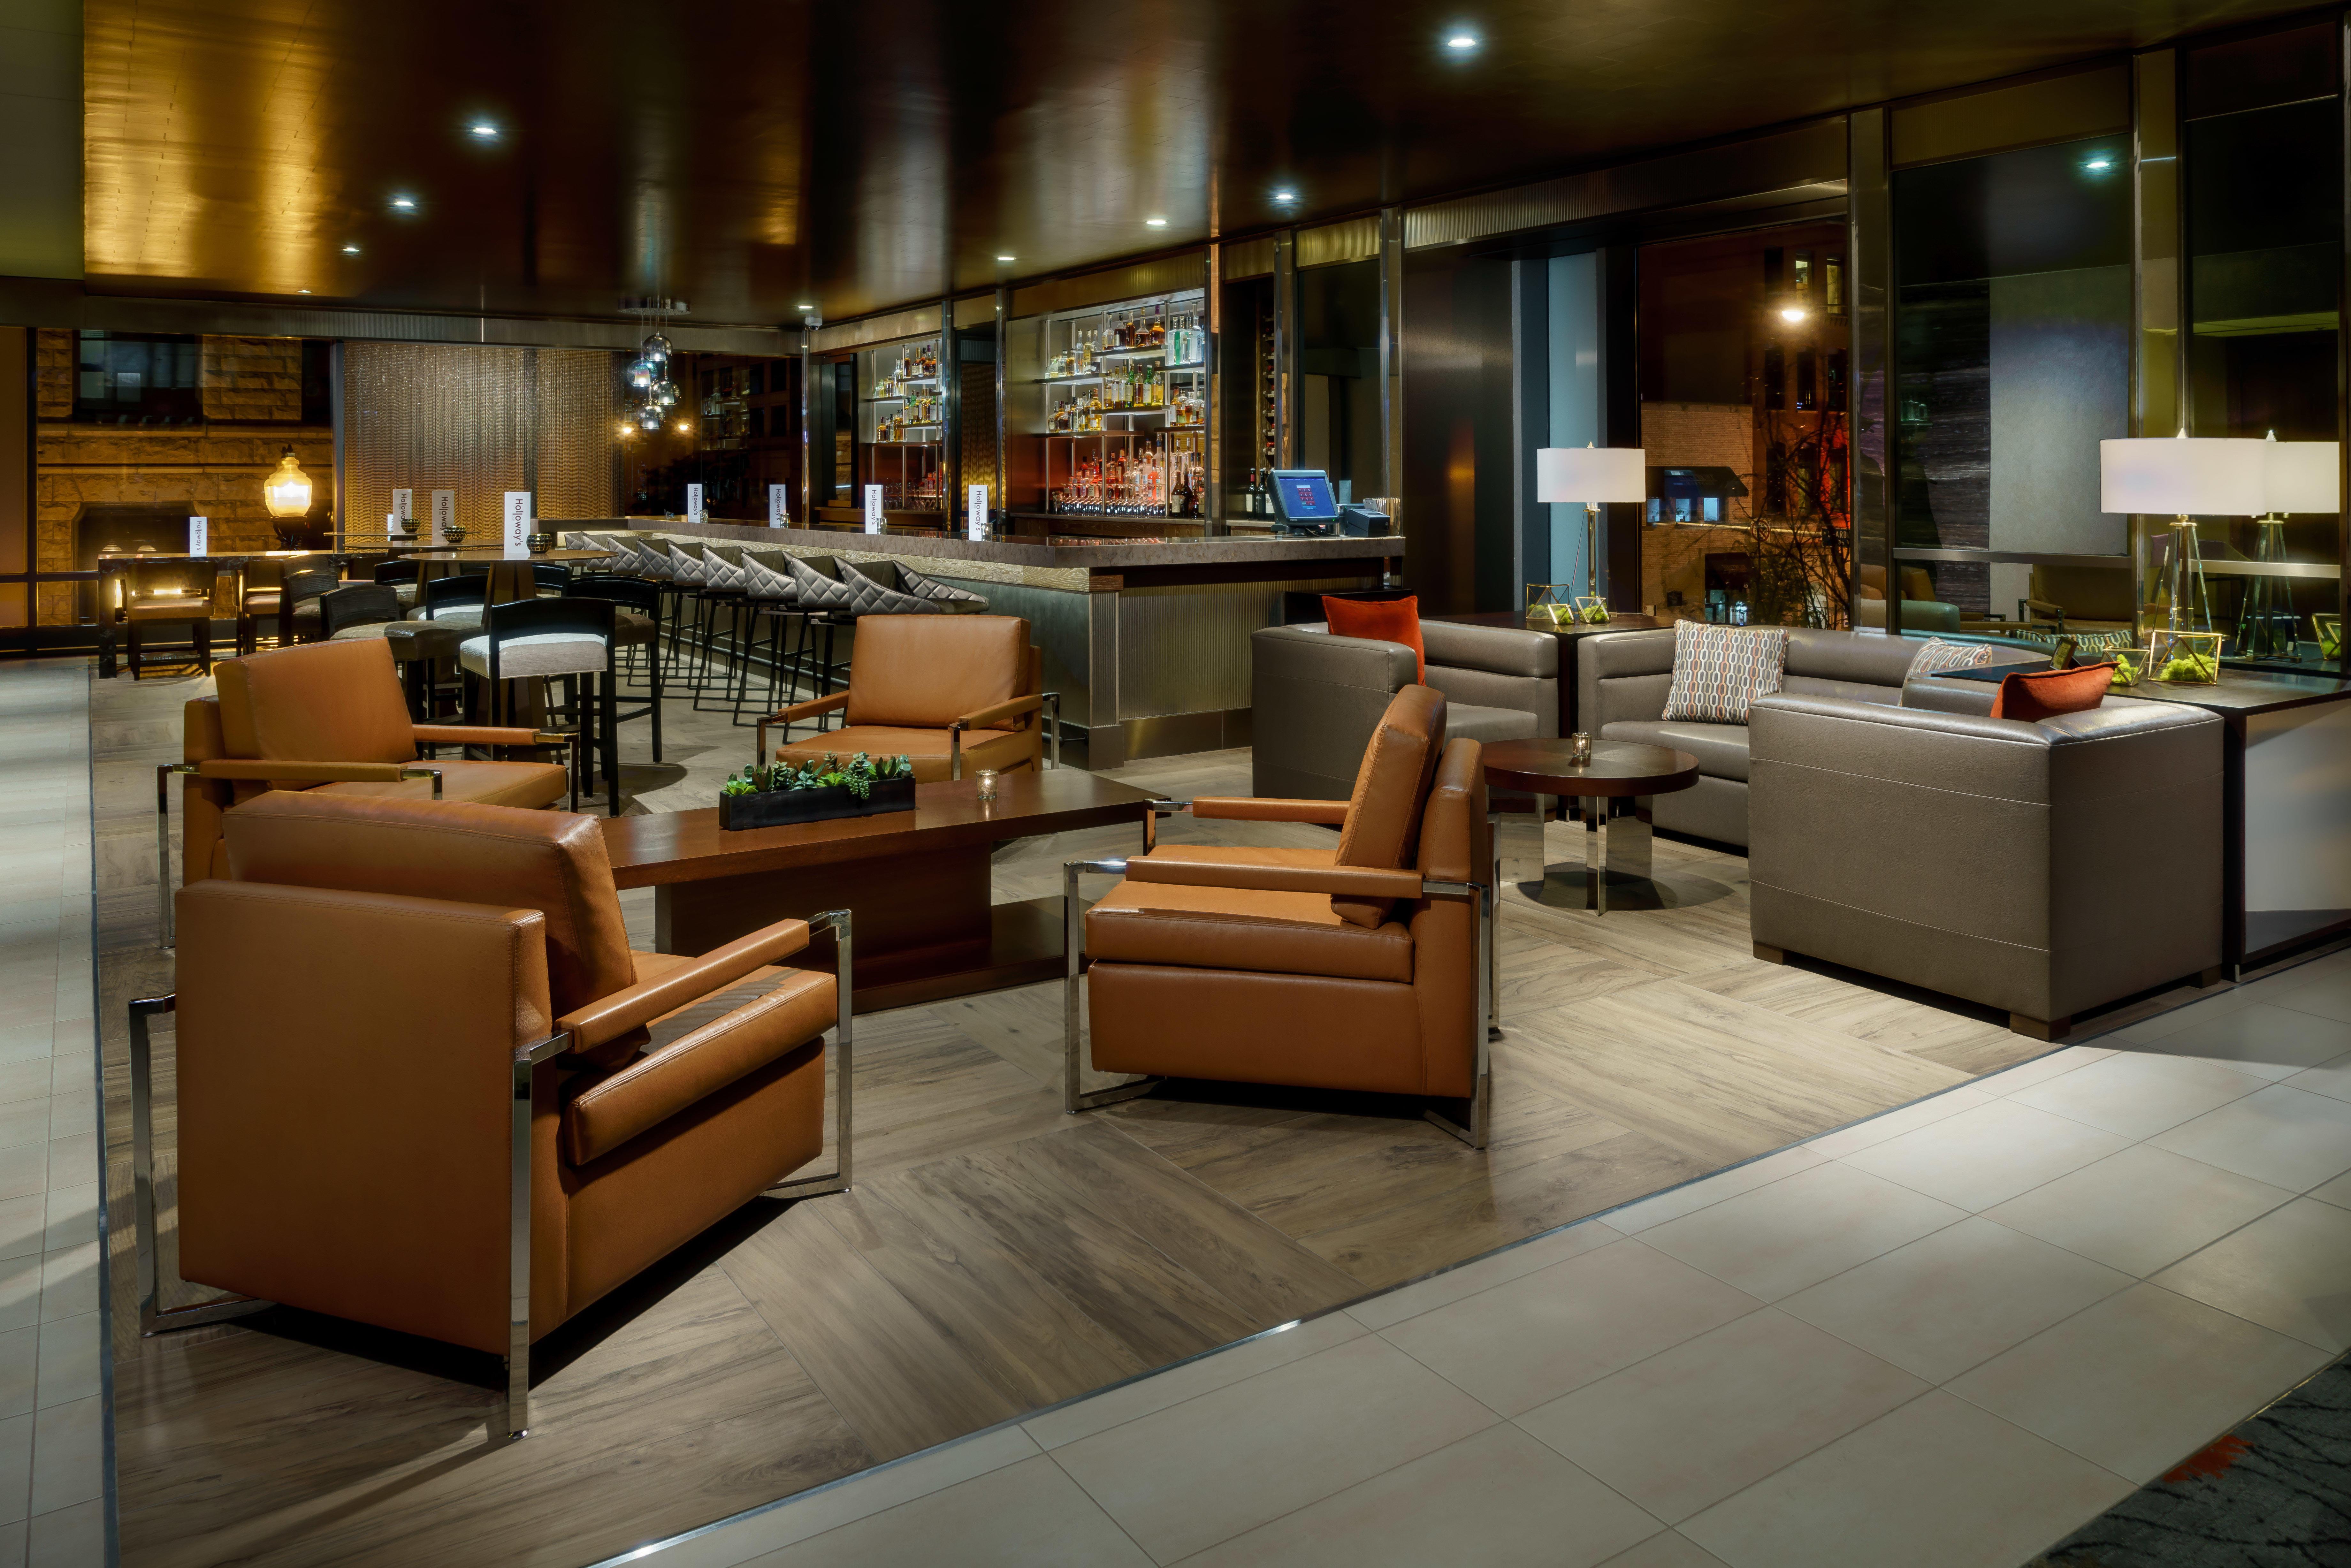 Holloway's Bar image 0